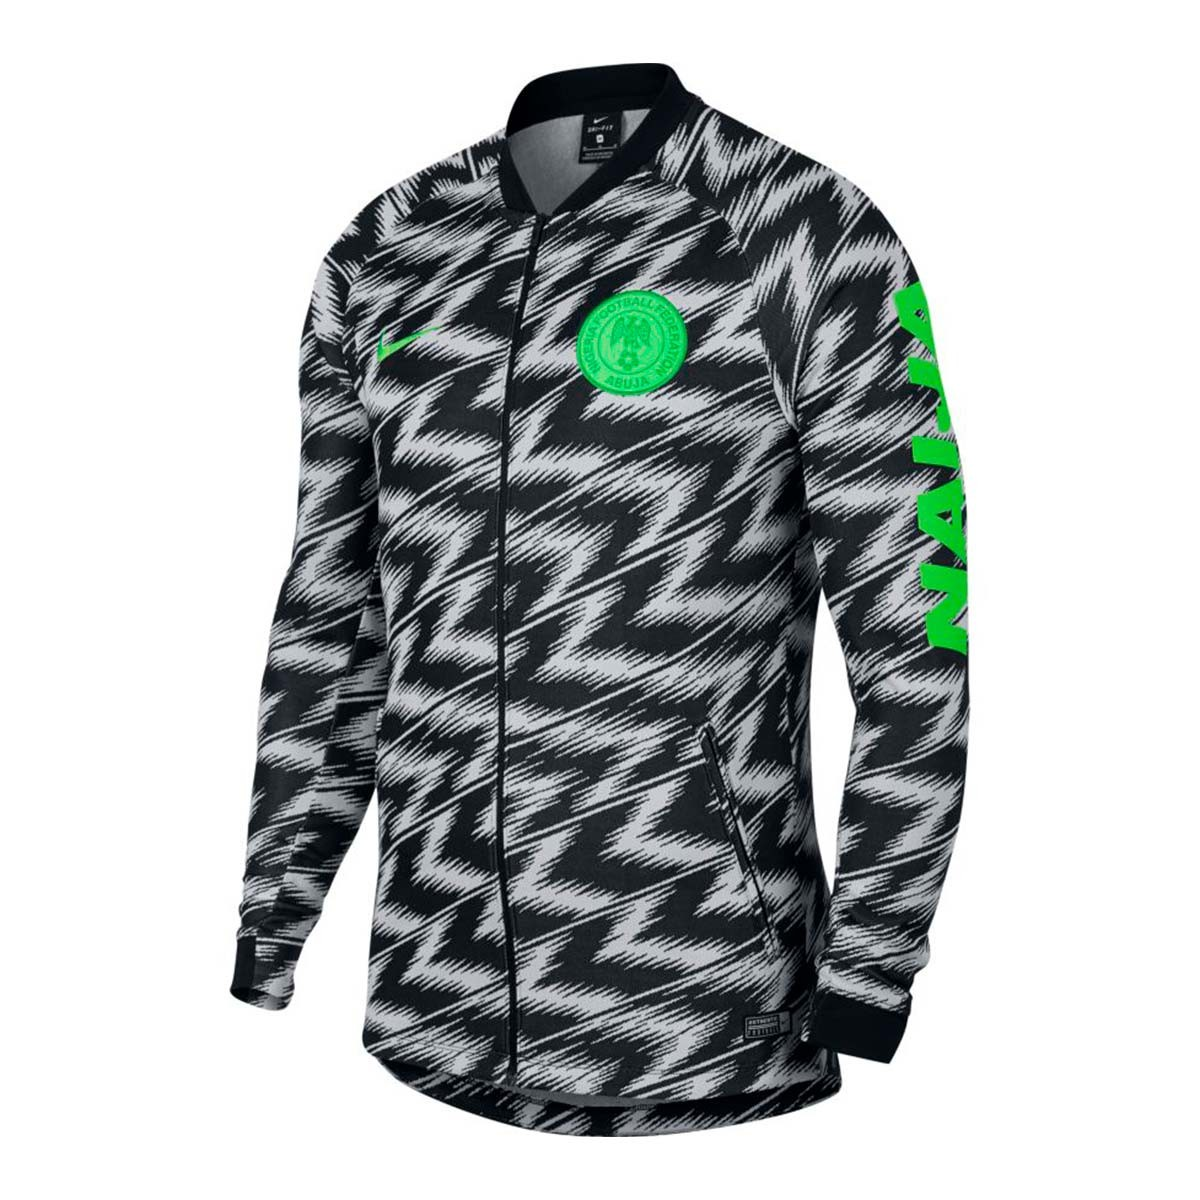 4946a812193 Jacket Nike Nigeria Pre-Match 2018-2019 White-Gren strike - Tienda ...